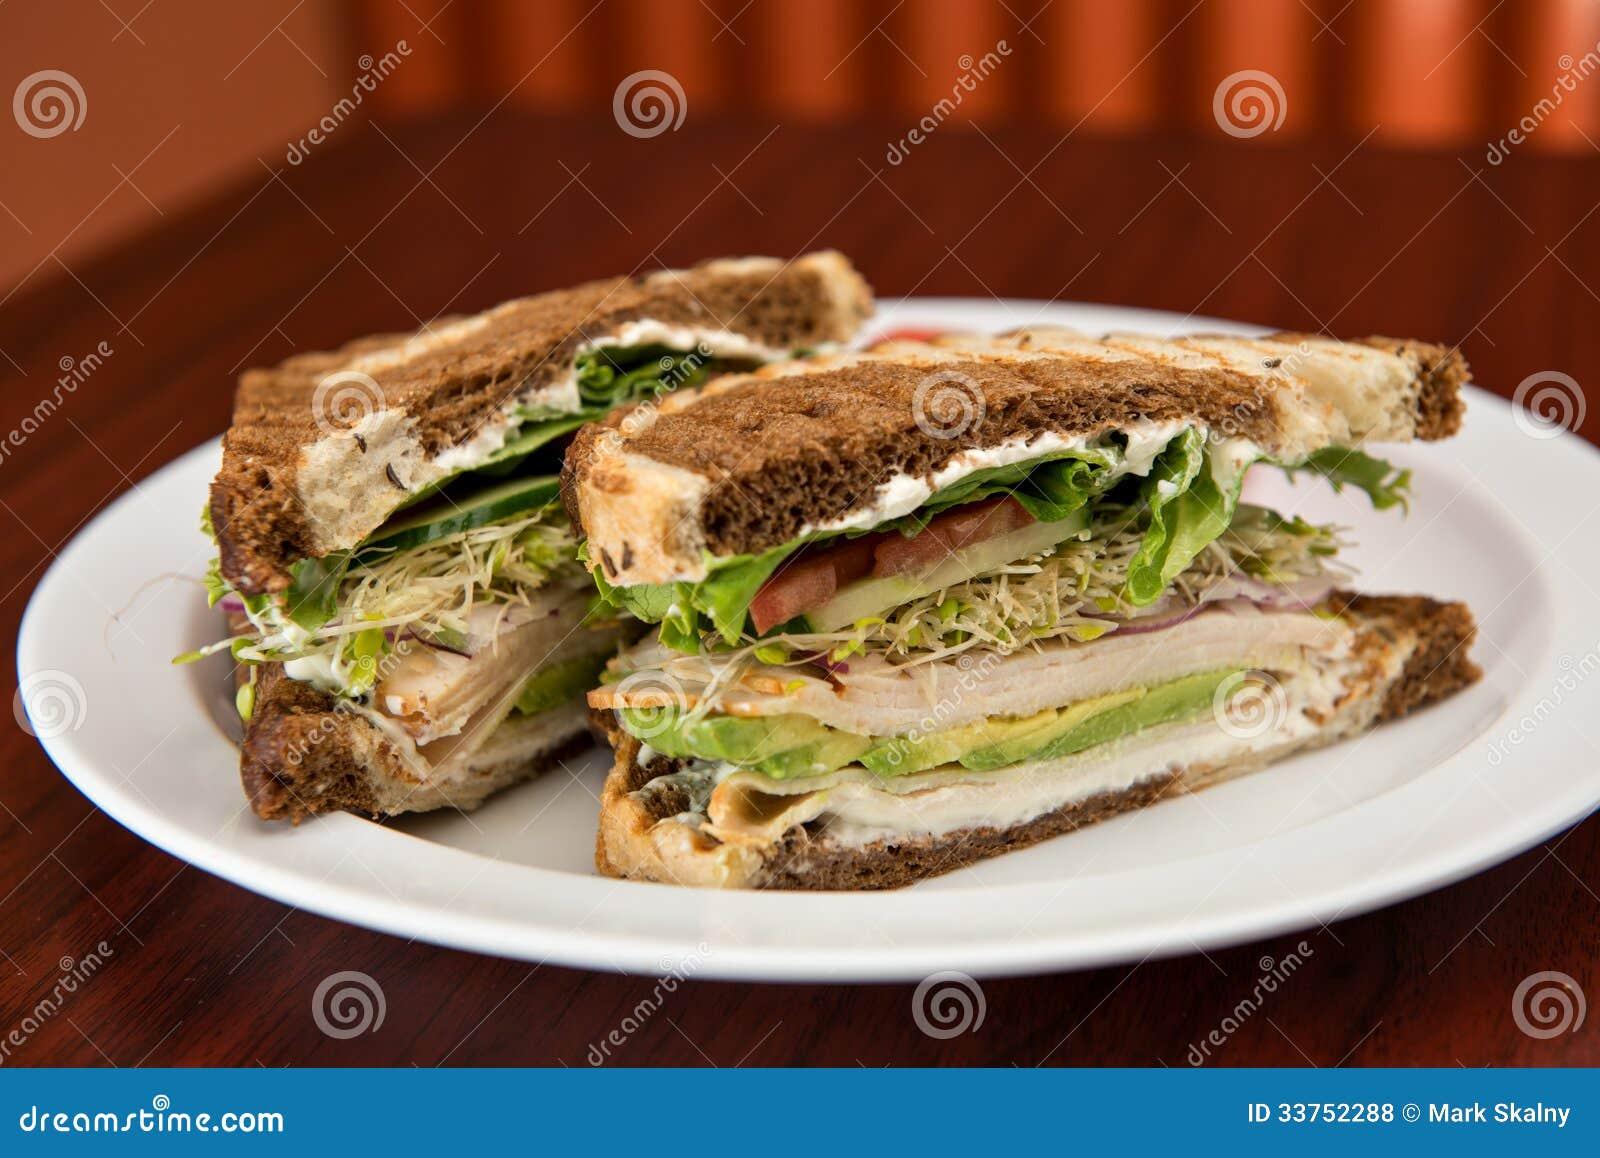 deli classic turkey sandwich with avocado on rye bread.